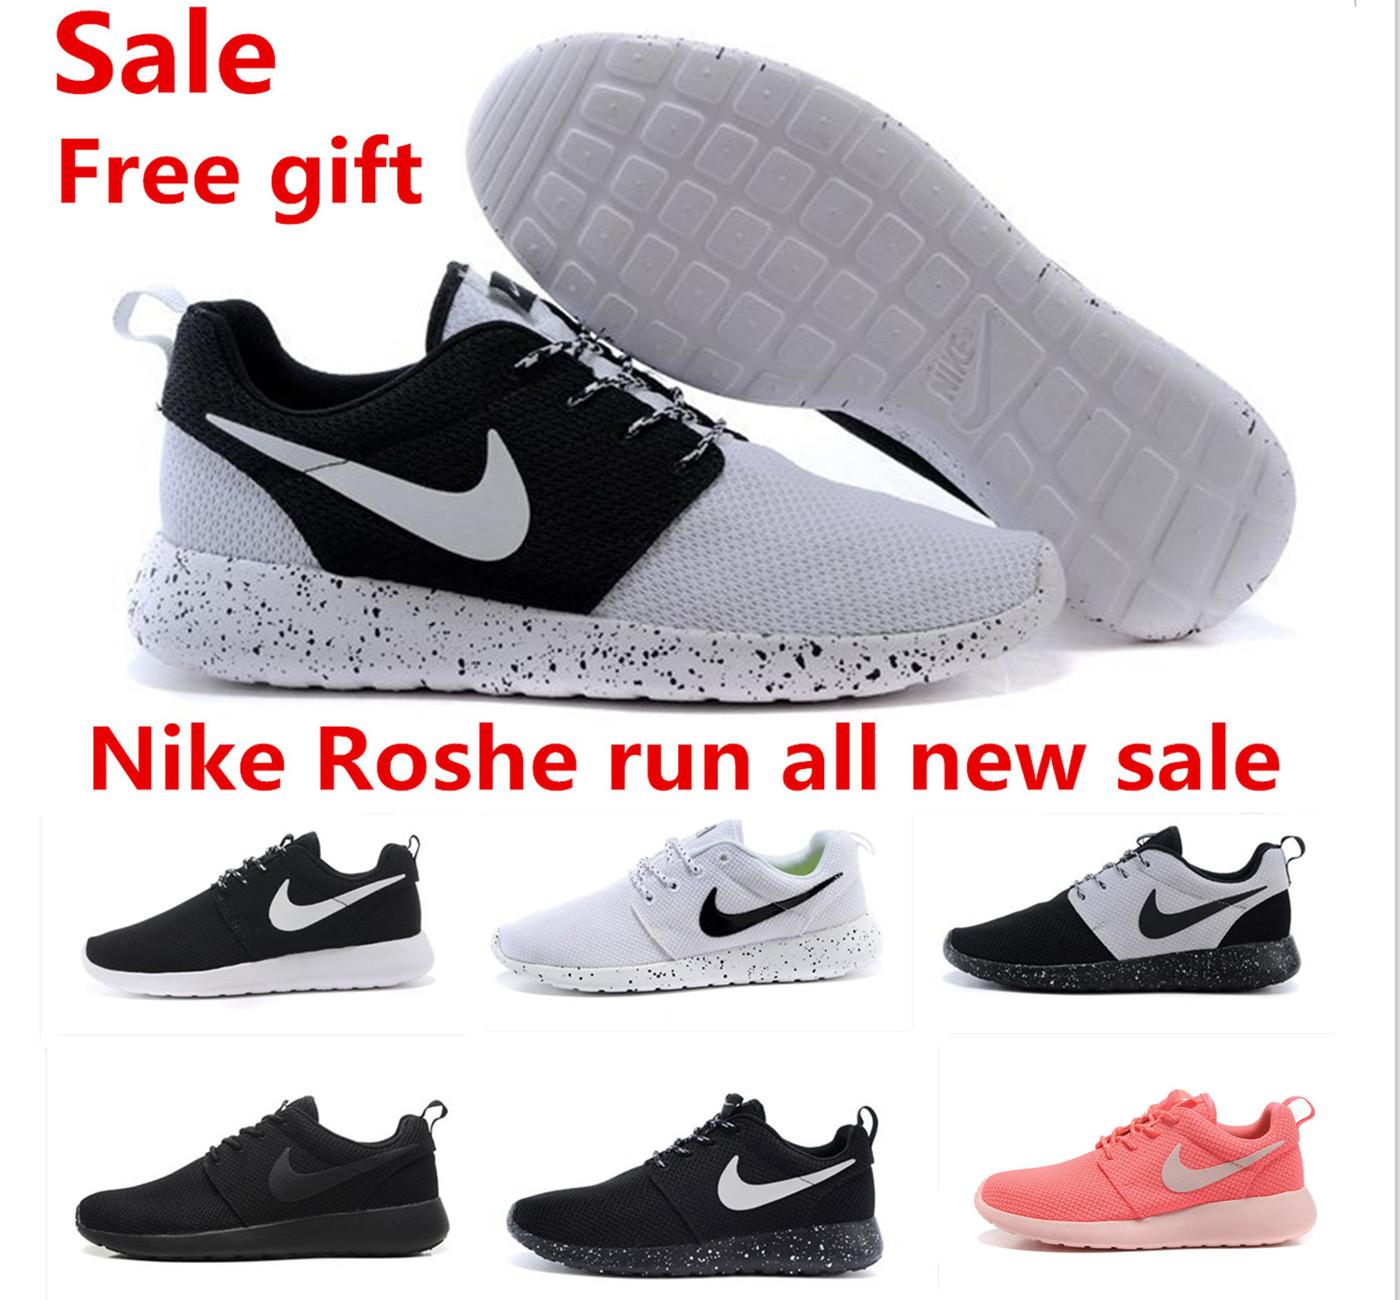 Original 2015 nikings roshing run men and women red rOsherun black and white nikings roshing runing+shOe size36-45 free(China (Mainland))